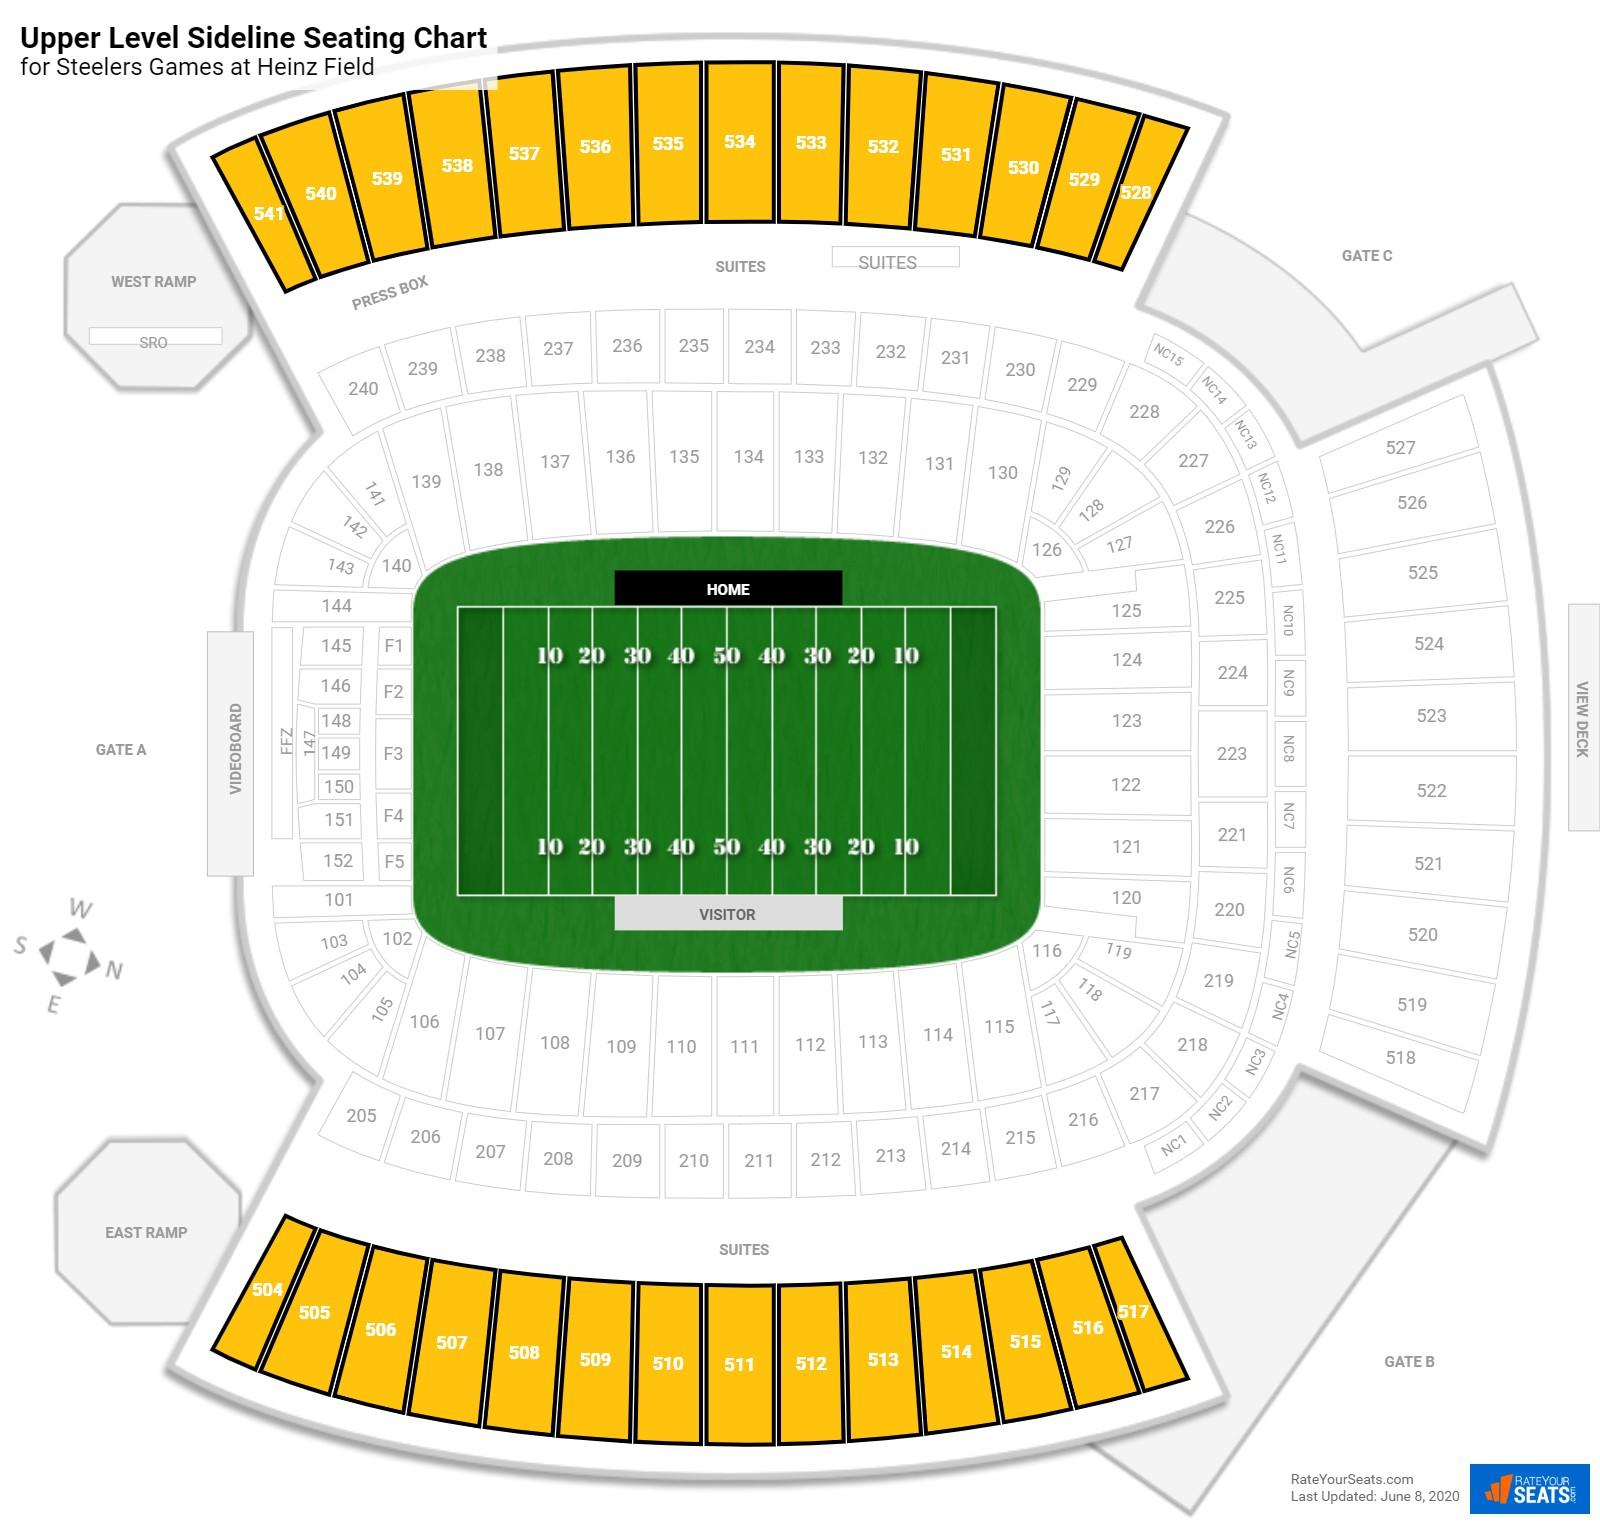 Upper Level Sideline Heinz Field Football Seating